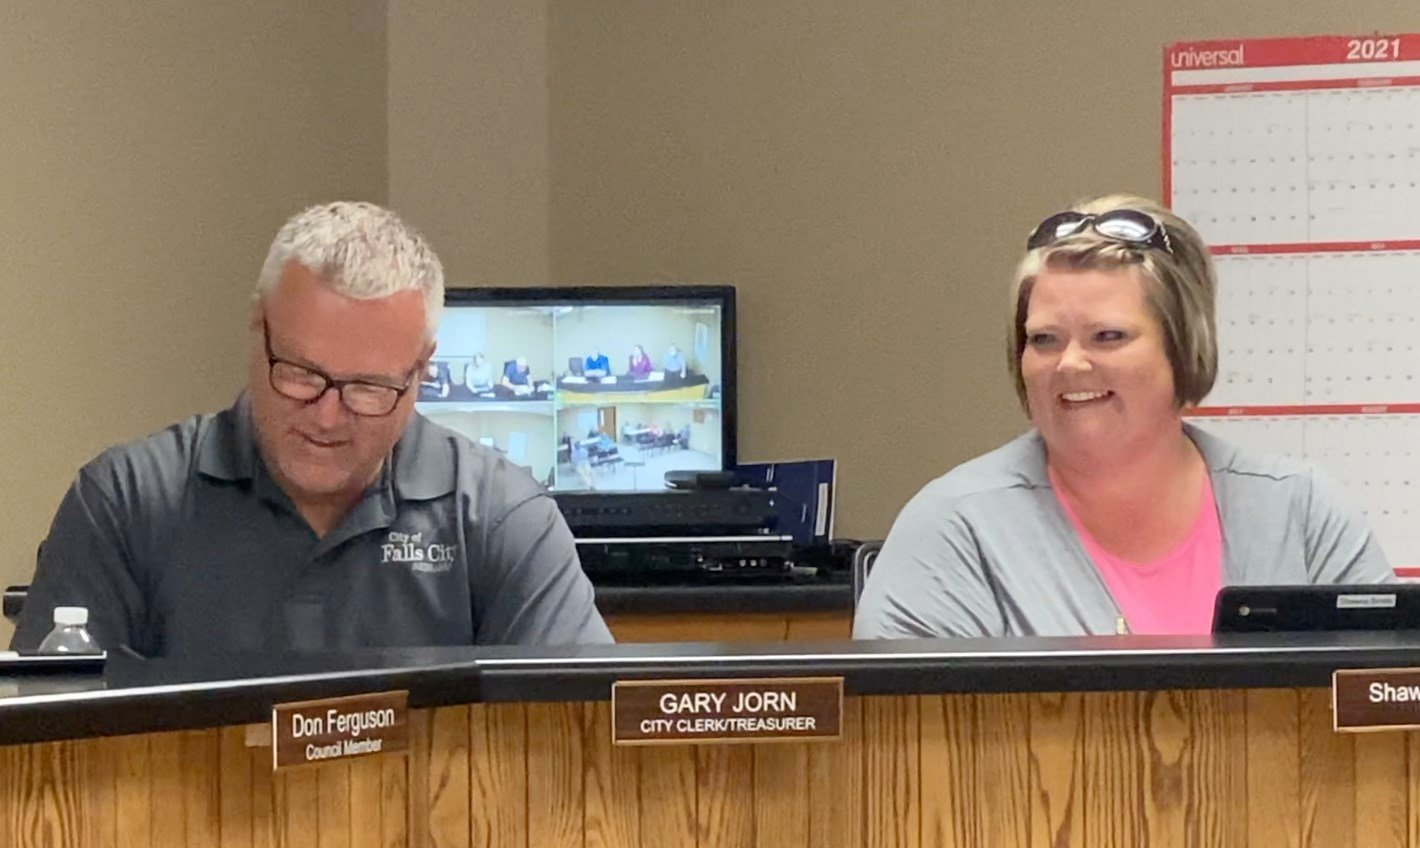 Mayor Bindle donates pool passes for checkout at Falls City library